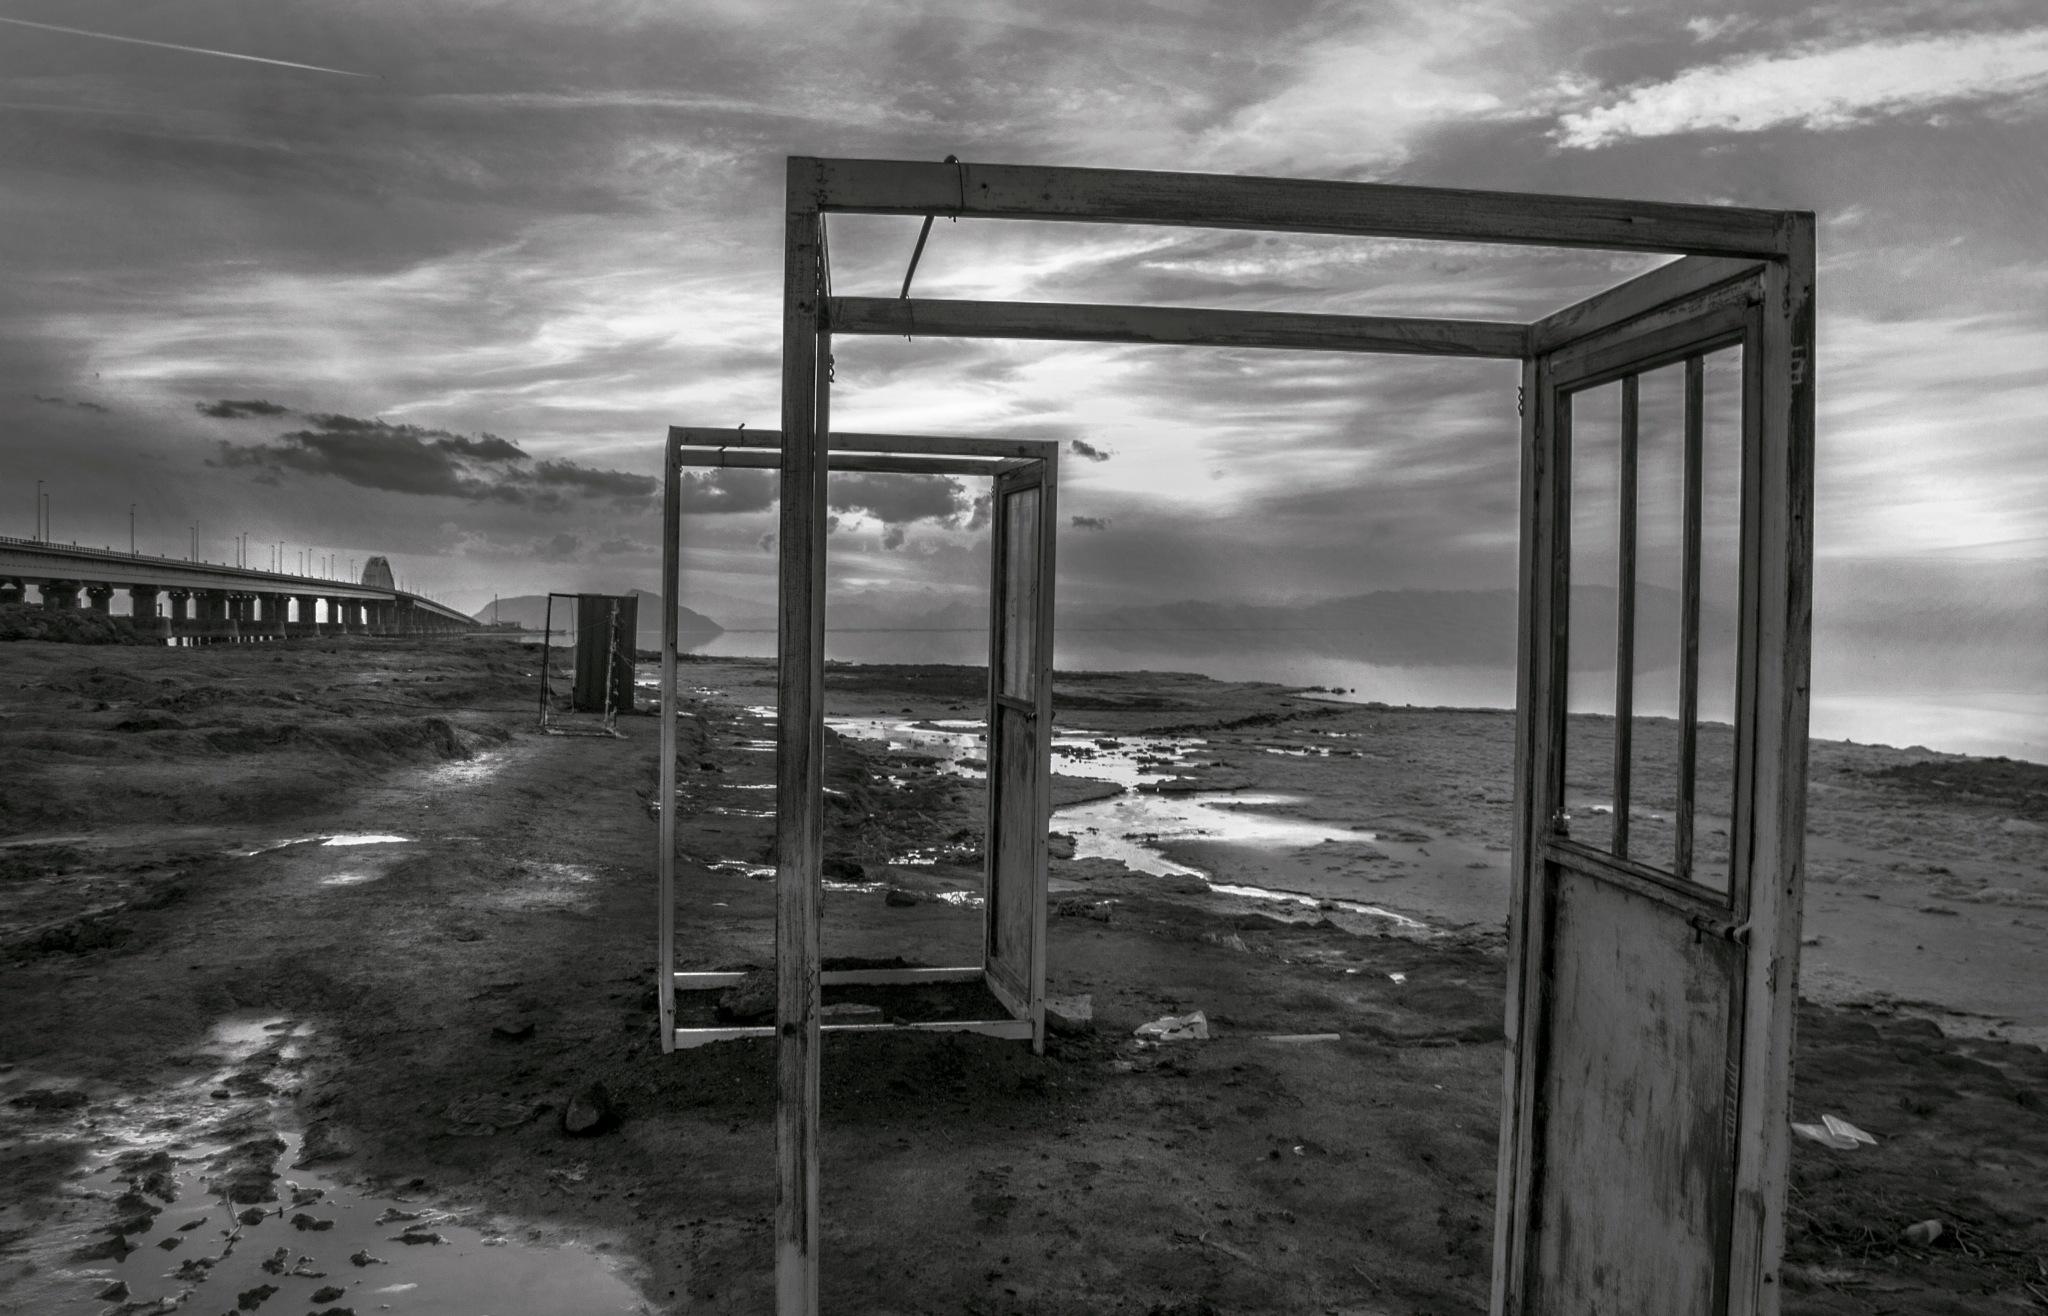 salt and bridge by Hiva Maroufi